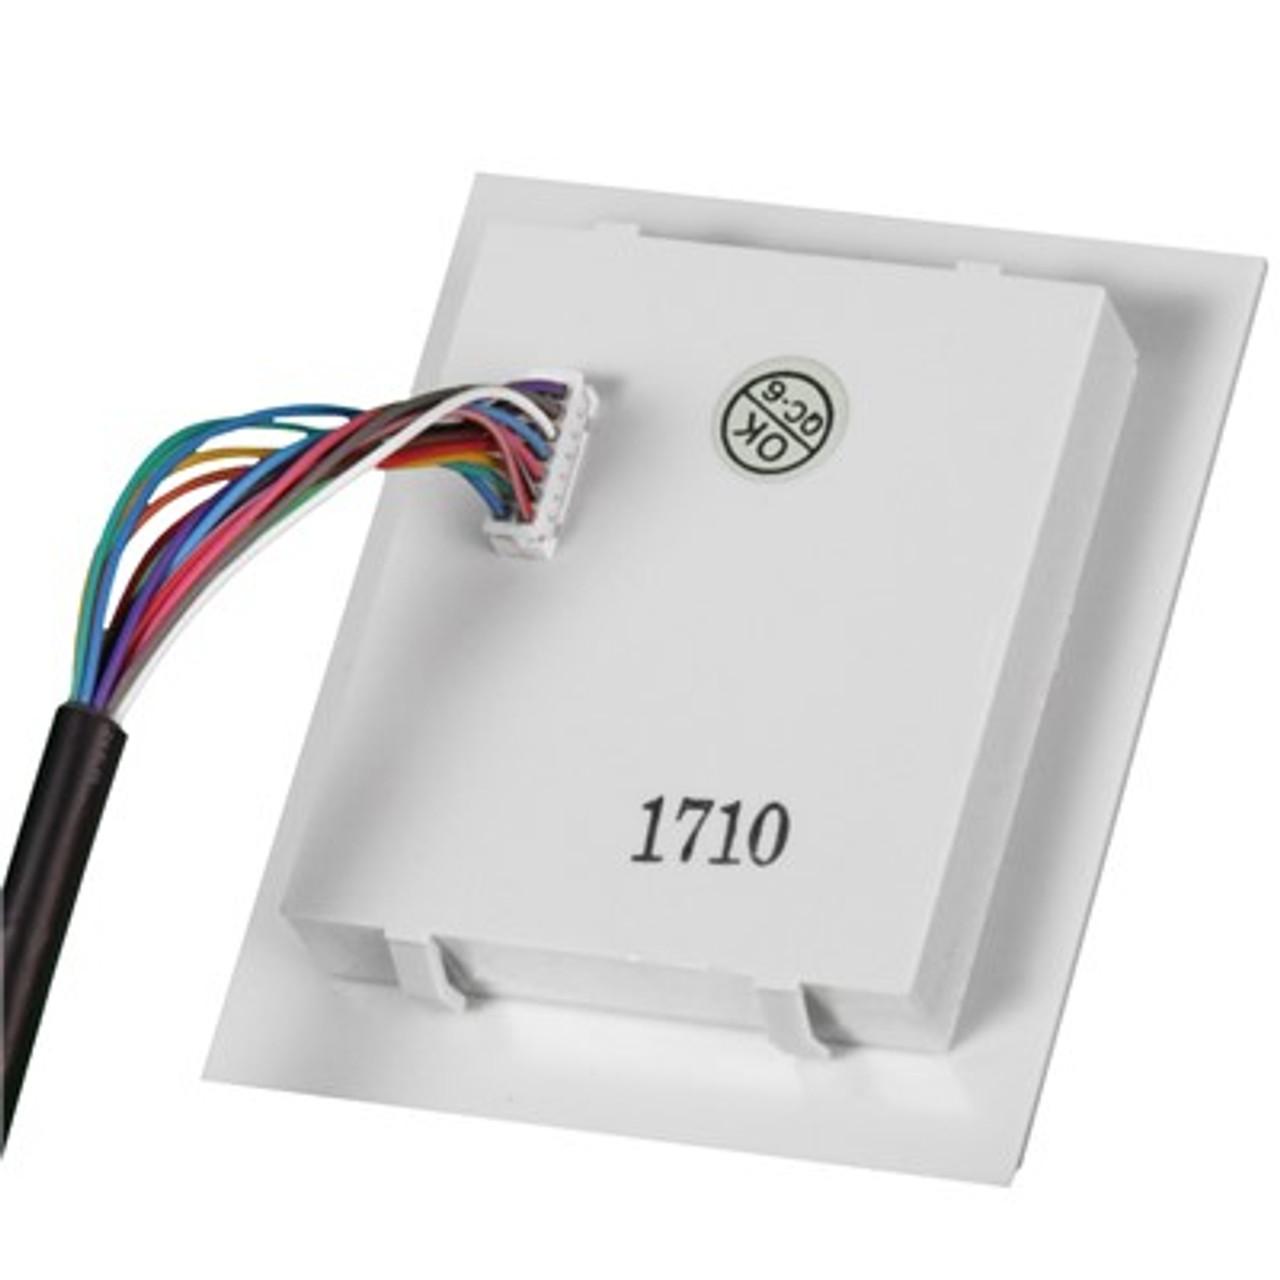 Imass water heater control panel